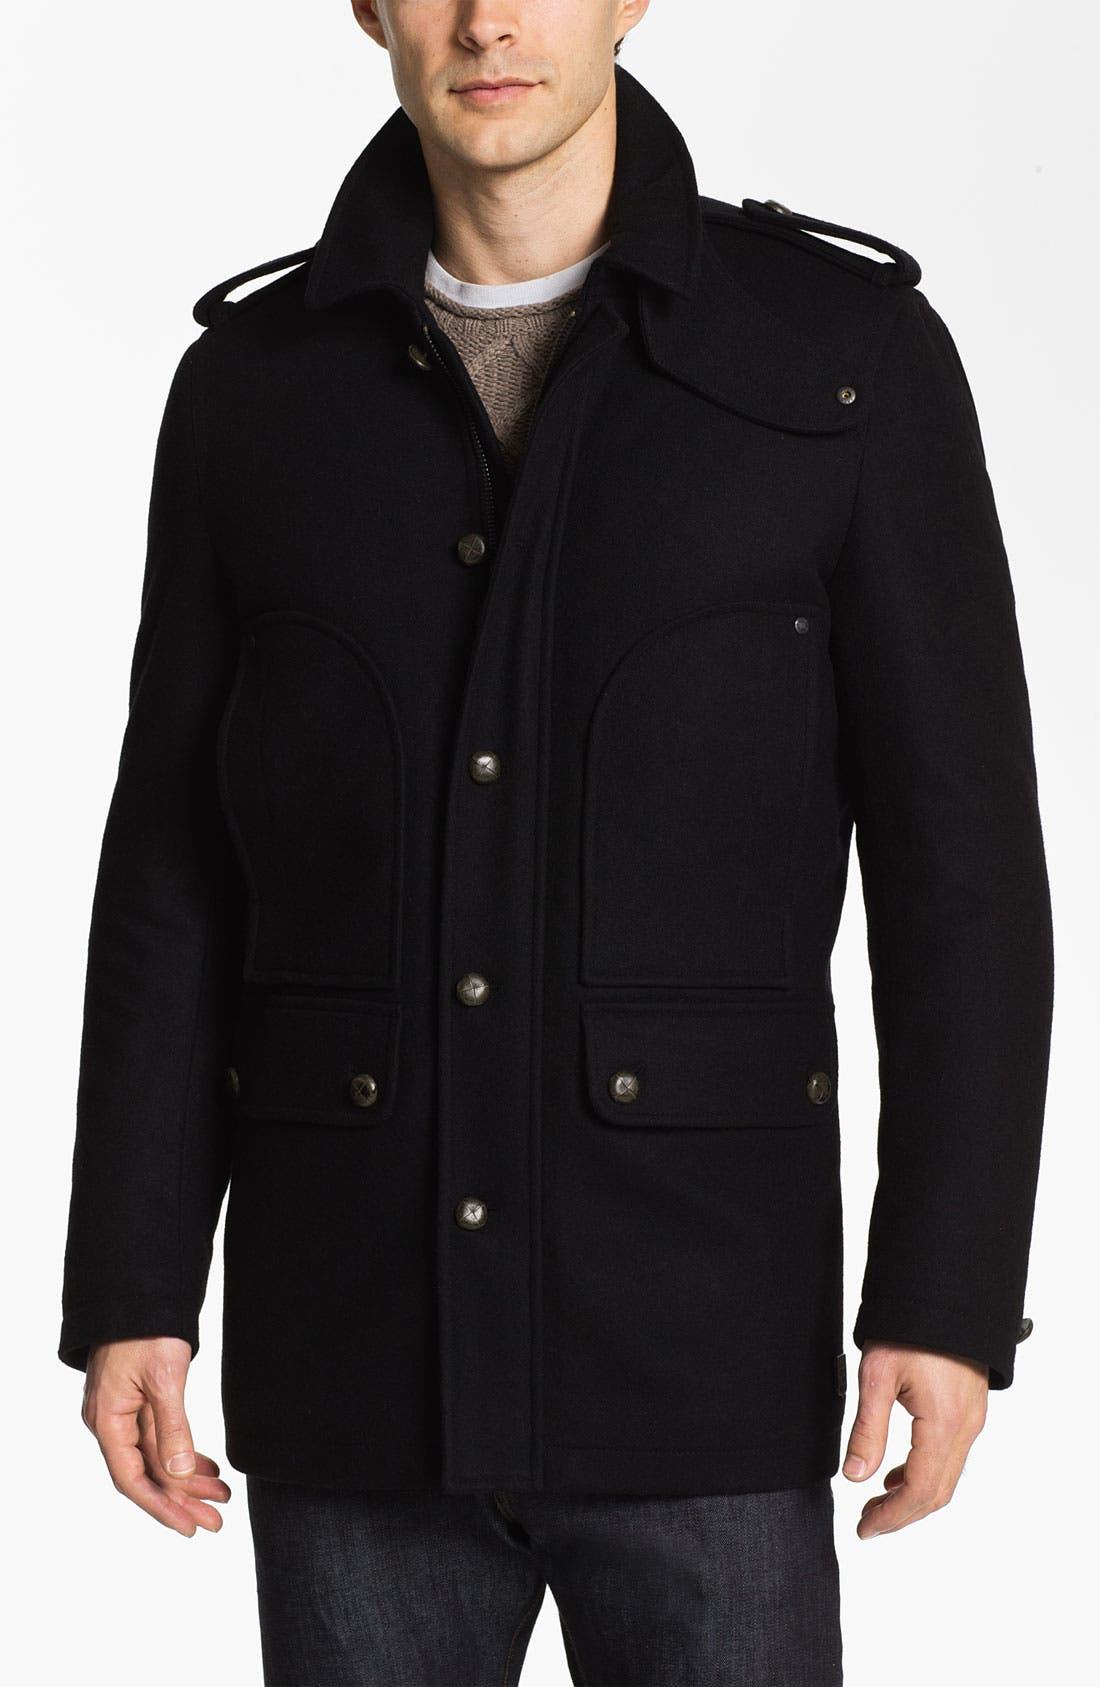 Alternate Image 1 Selected - Vince Camuto Wool & Cashmere Blend Car Coat